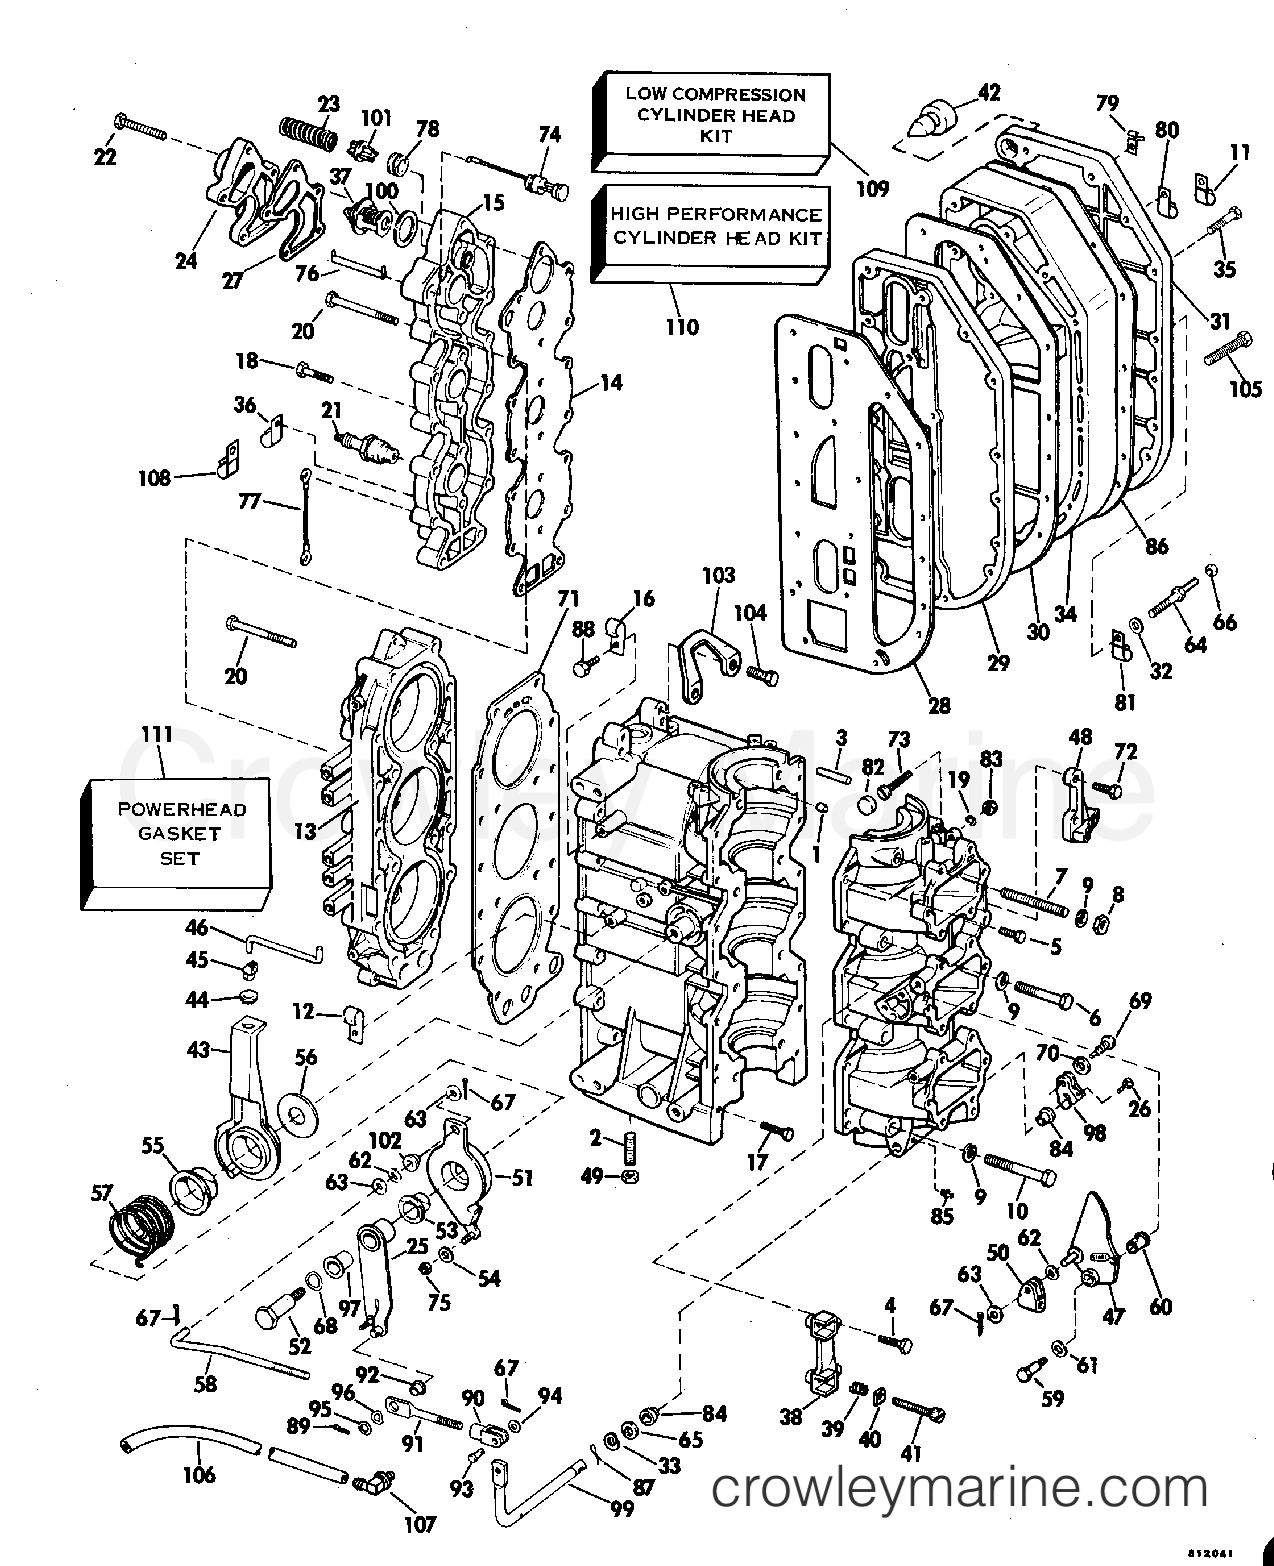 1981 Evinrude Outboards 70 - E70ELCIH CYLINDER & CRANKCASE section